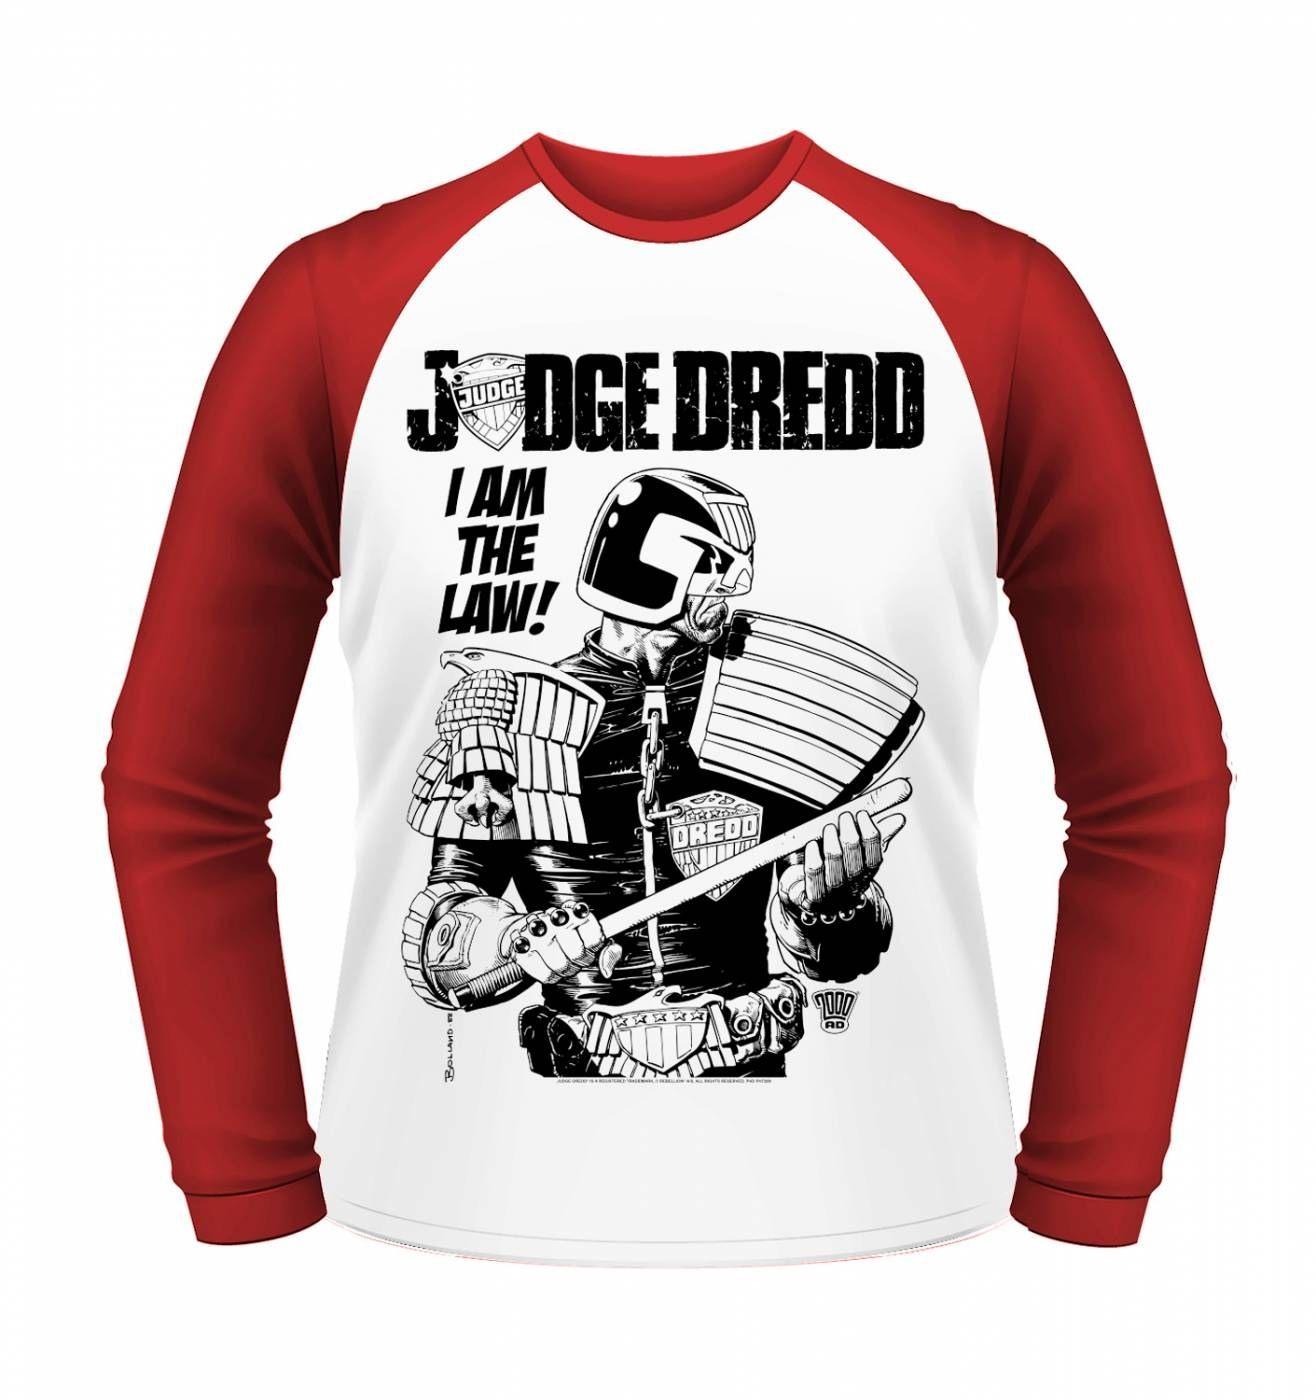 OFFICIAL Judge Dredd I Am The Law long sleeved baseball shirt